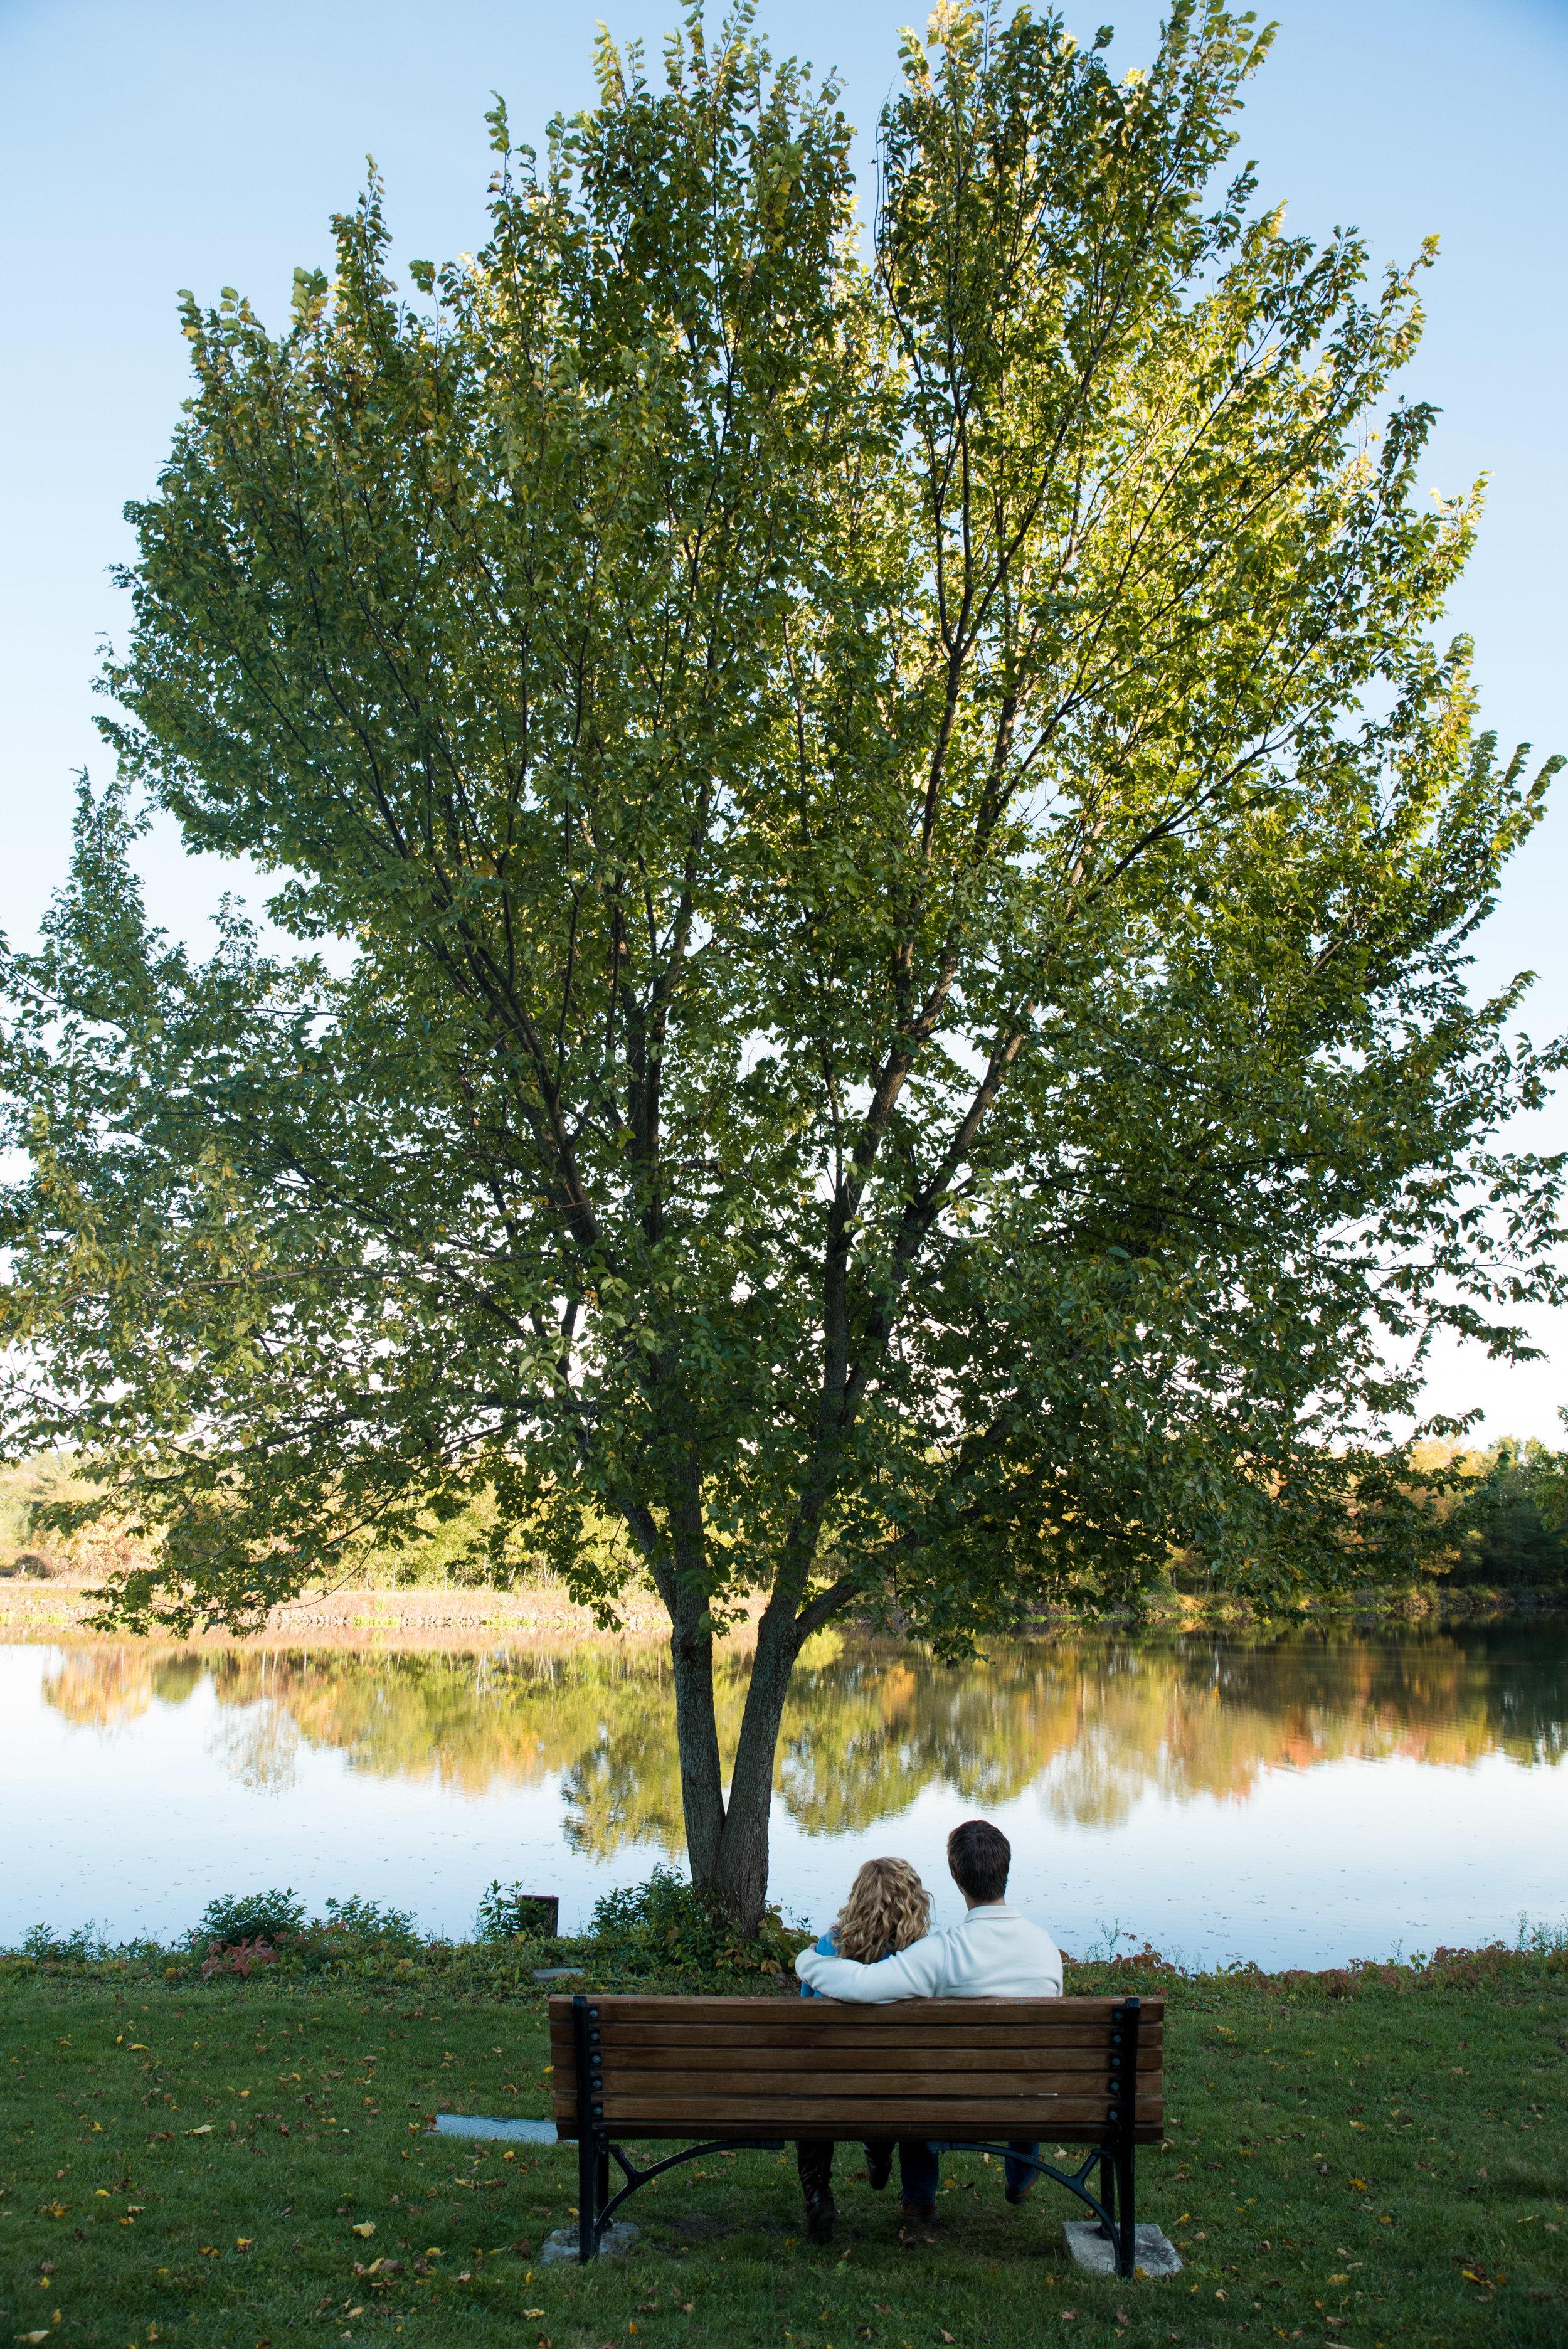 Riverbend Farm engagement photos in Uxbridge, MA photographed by Kara Emiy Krantz Photography